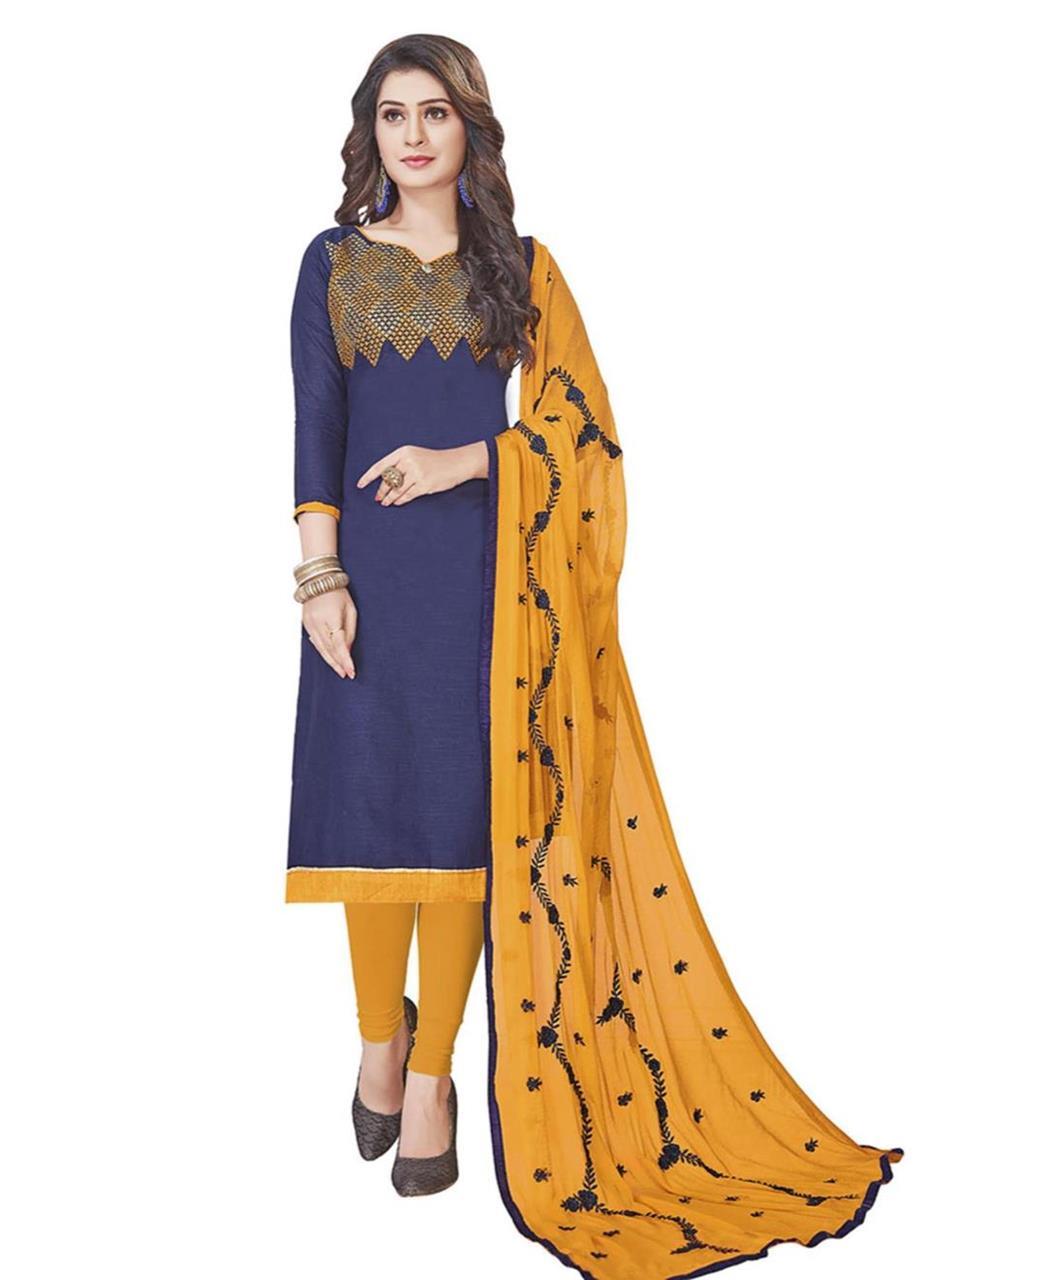 Embroidered Cotton Navyblue Straight Cut Salwar